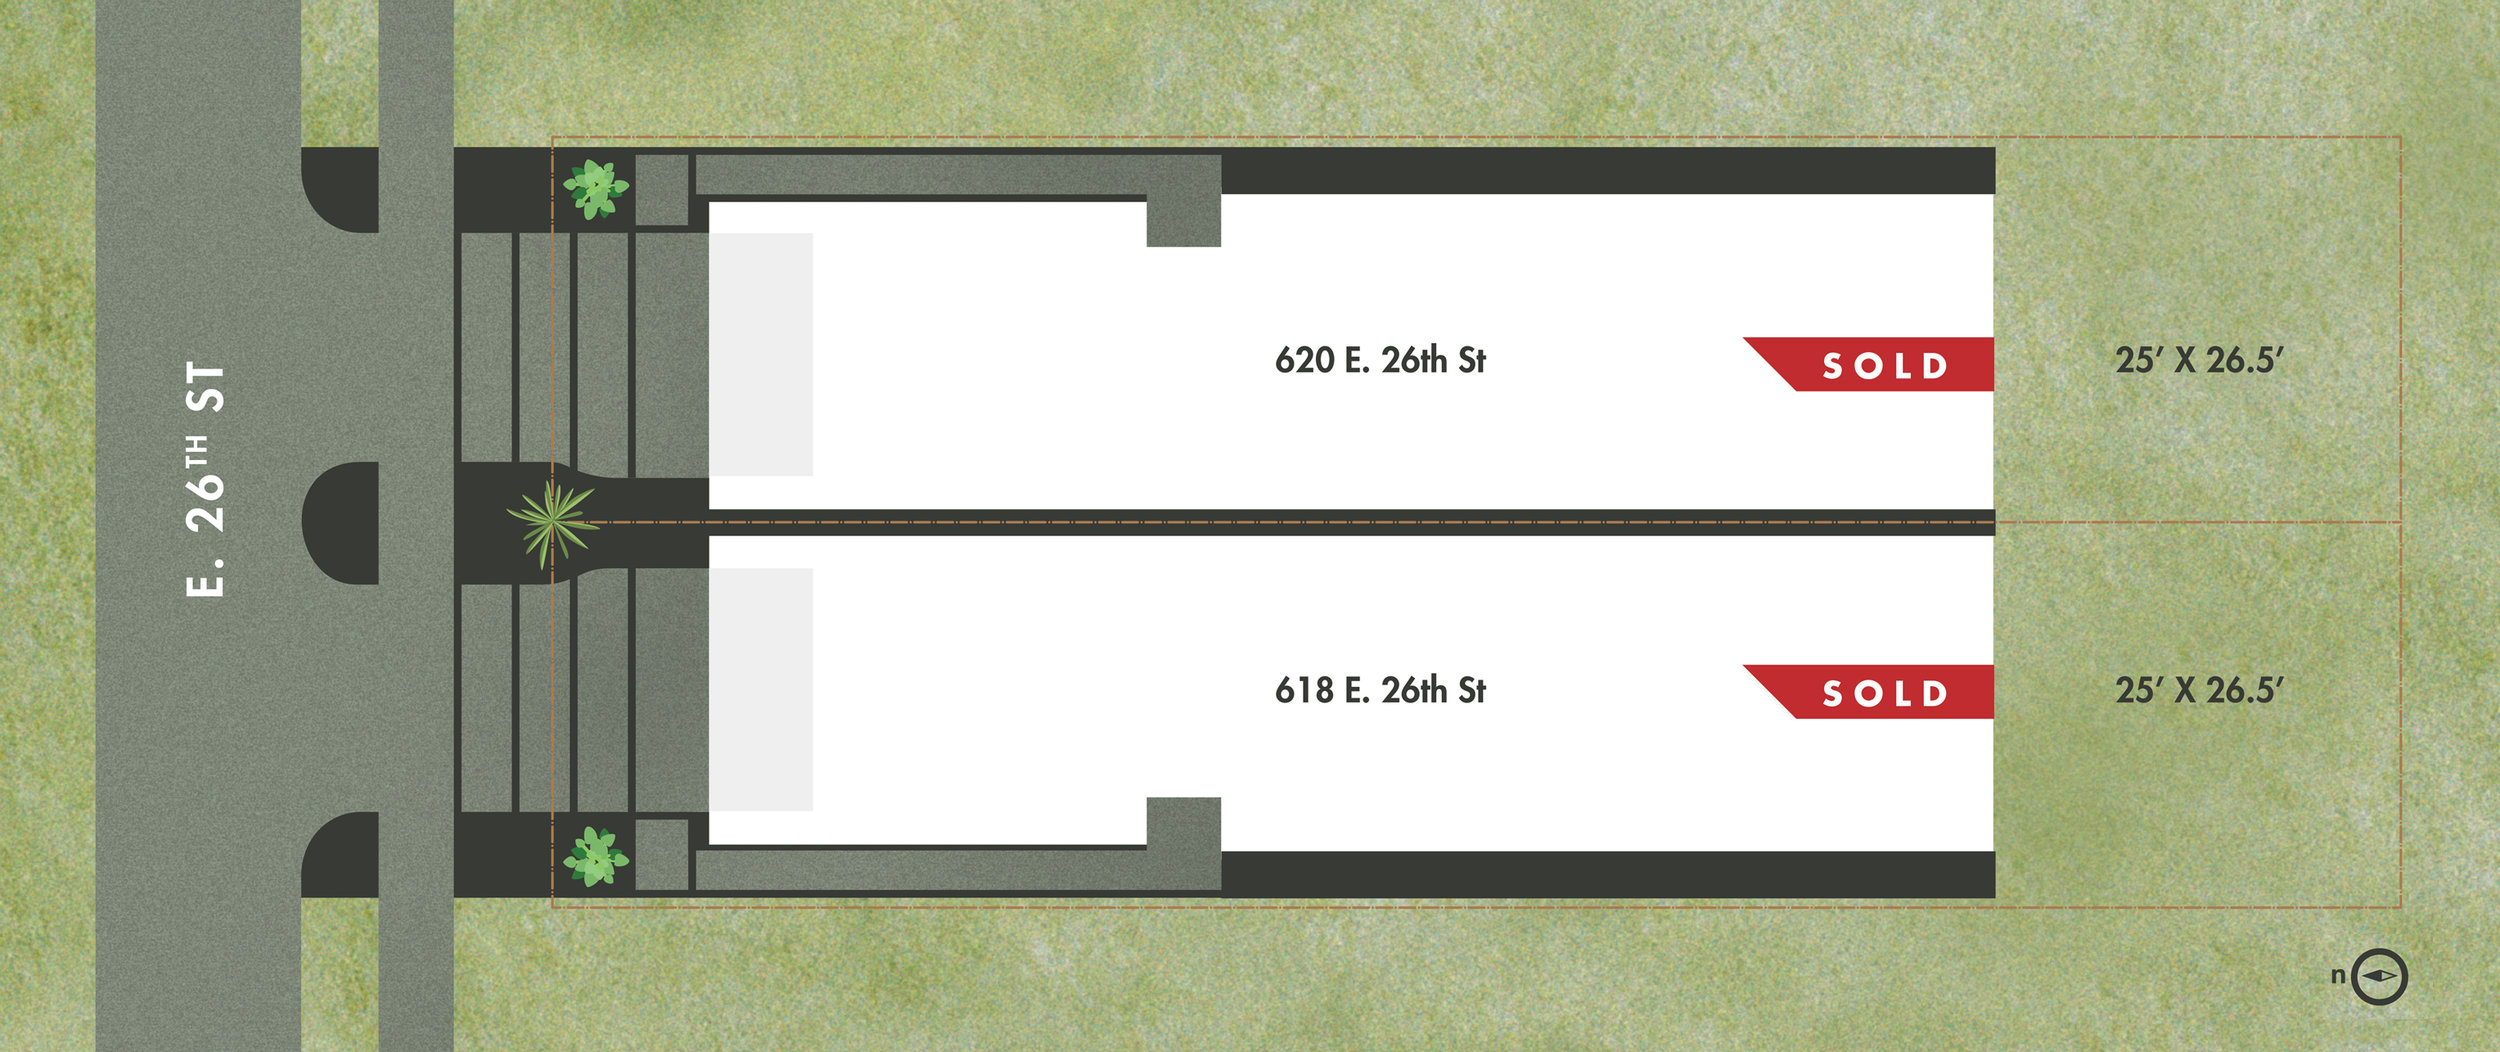 618-620_E_26th_Siteplan.jpg